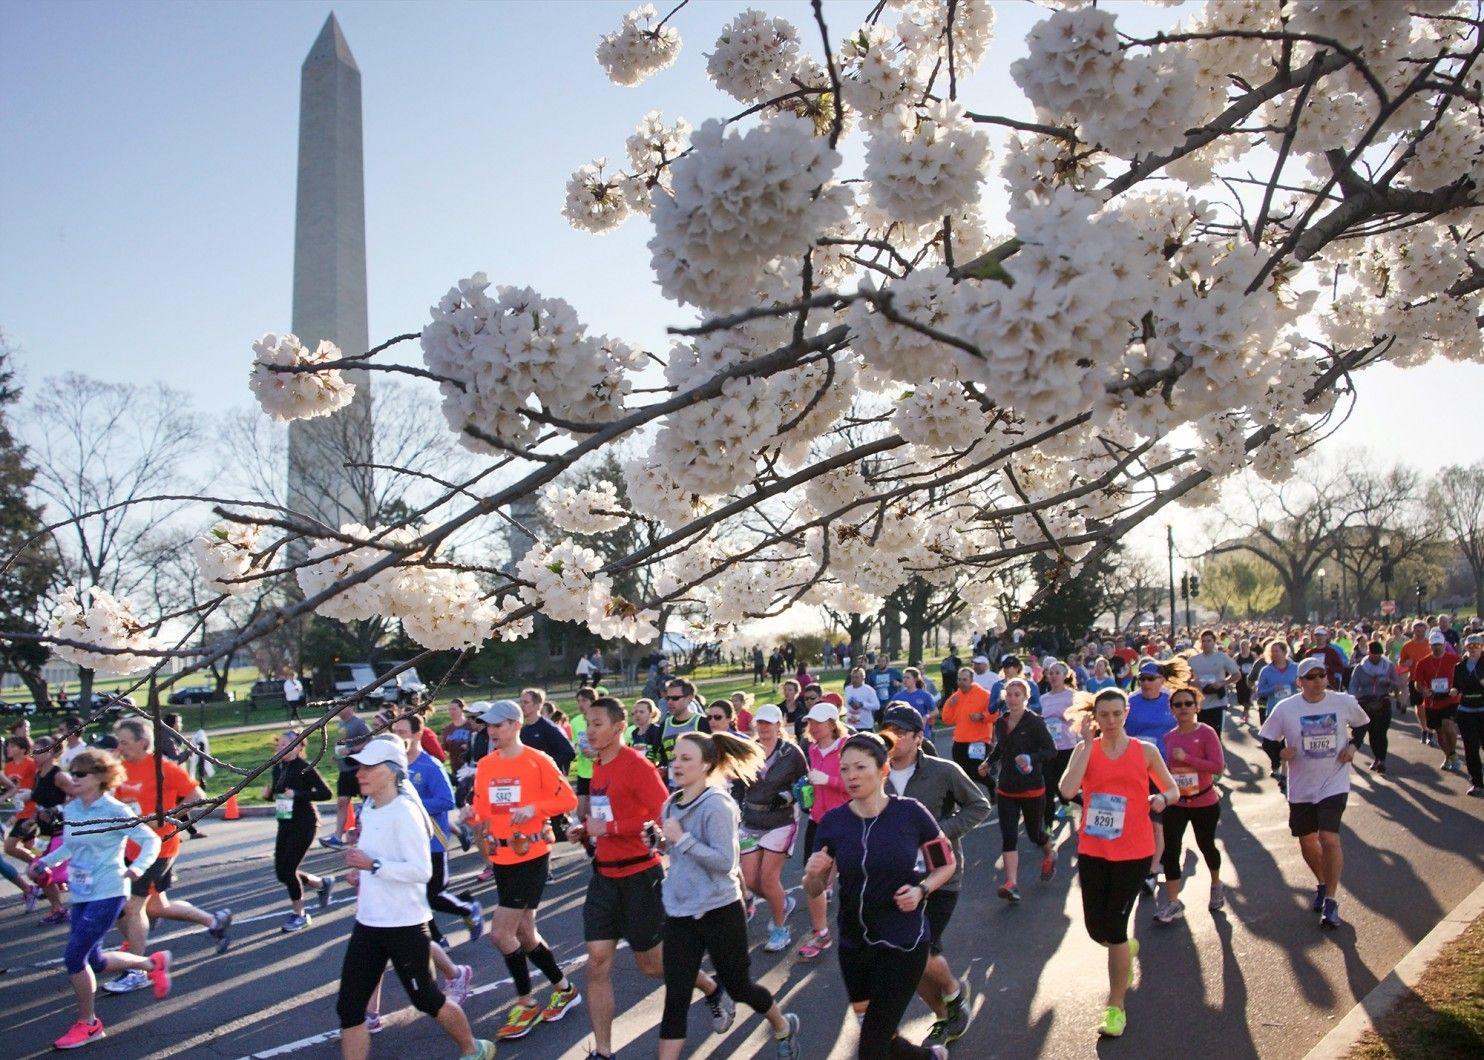 Cherry Blossom Ten Mile Run - Washington, DC - 4/7/2019 ...